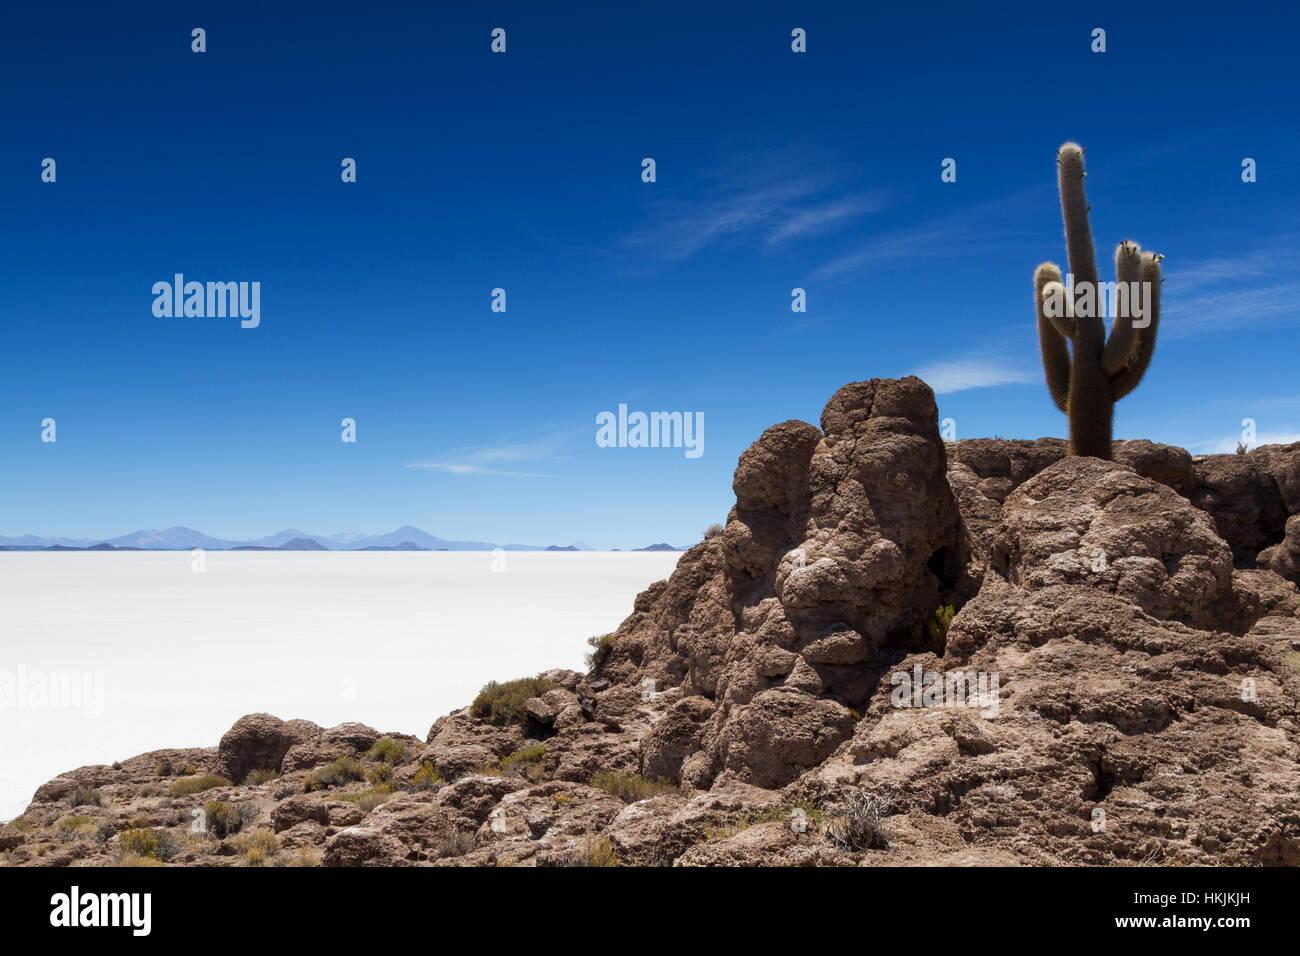 Aussichtspunkt Isla Pia Pia, Salar de Uyuni, Bolivien Stockbild